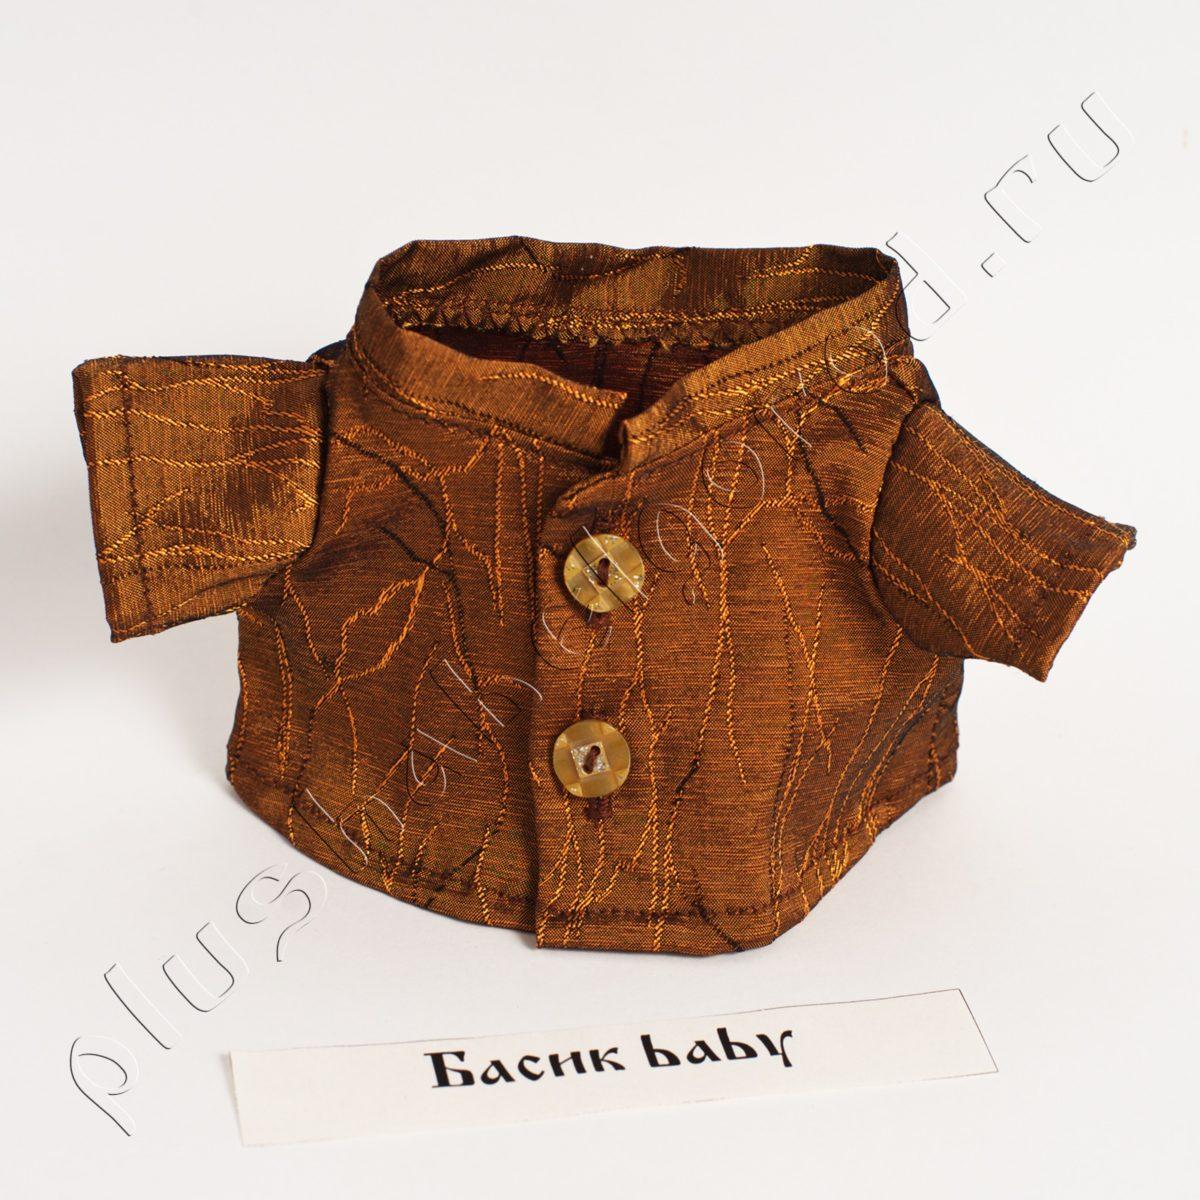 Рубашка коричневая для Басика baby